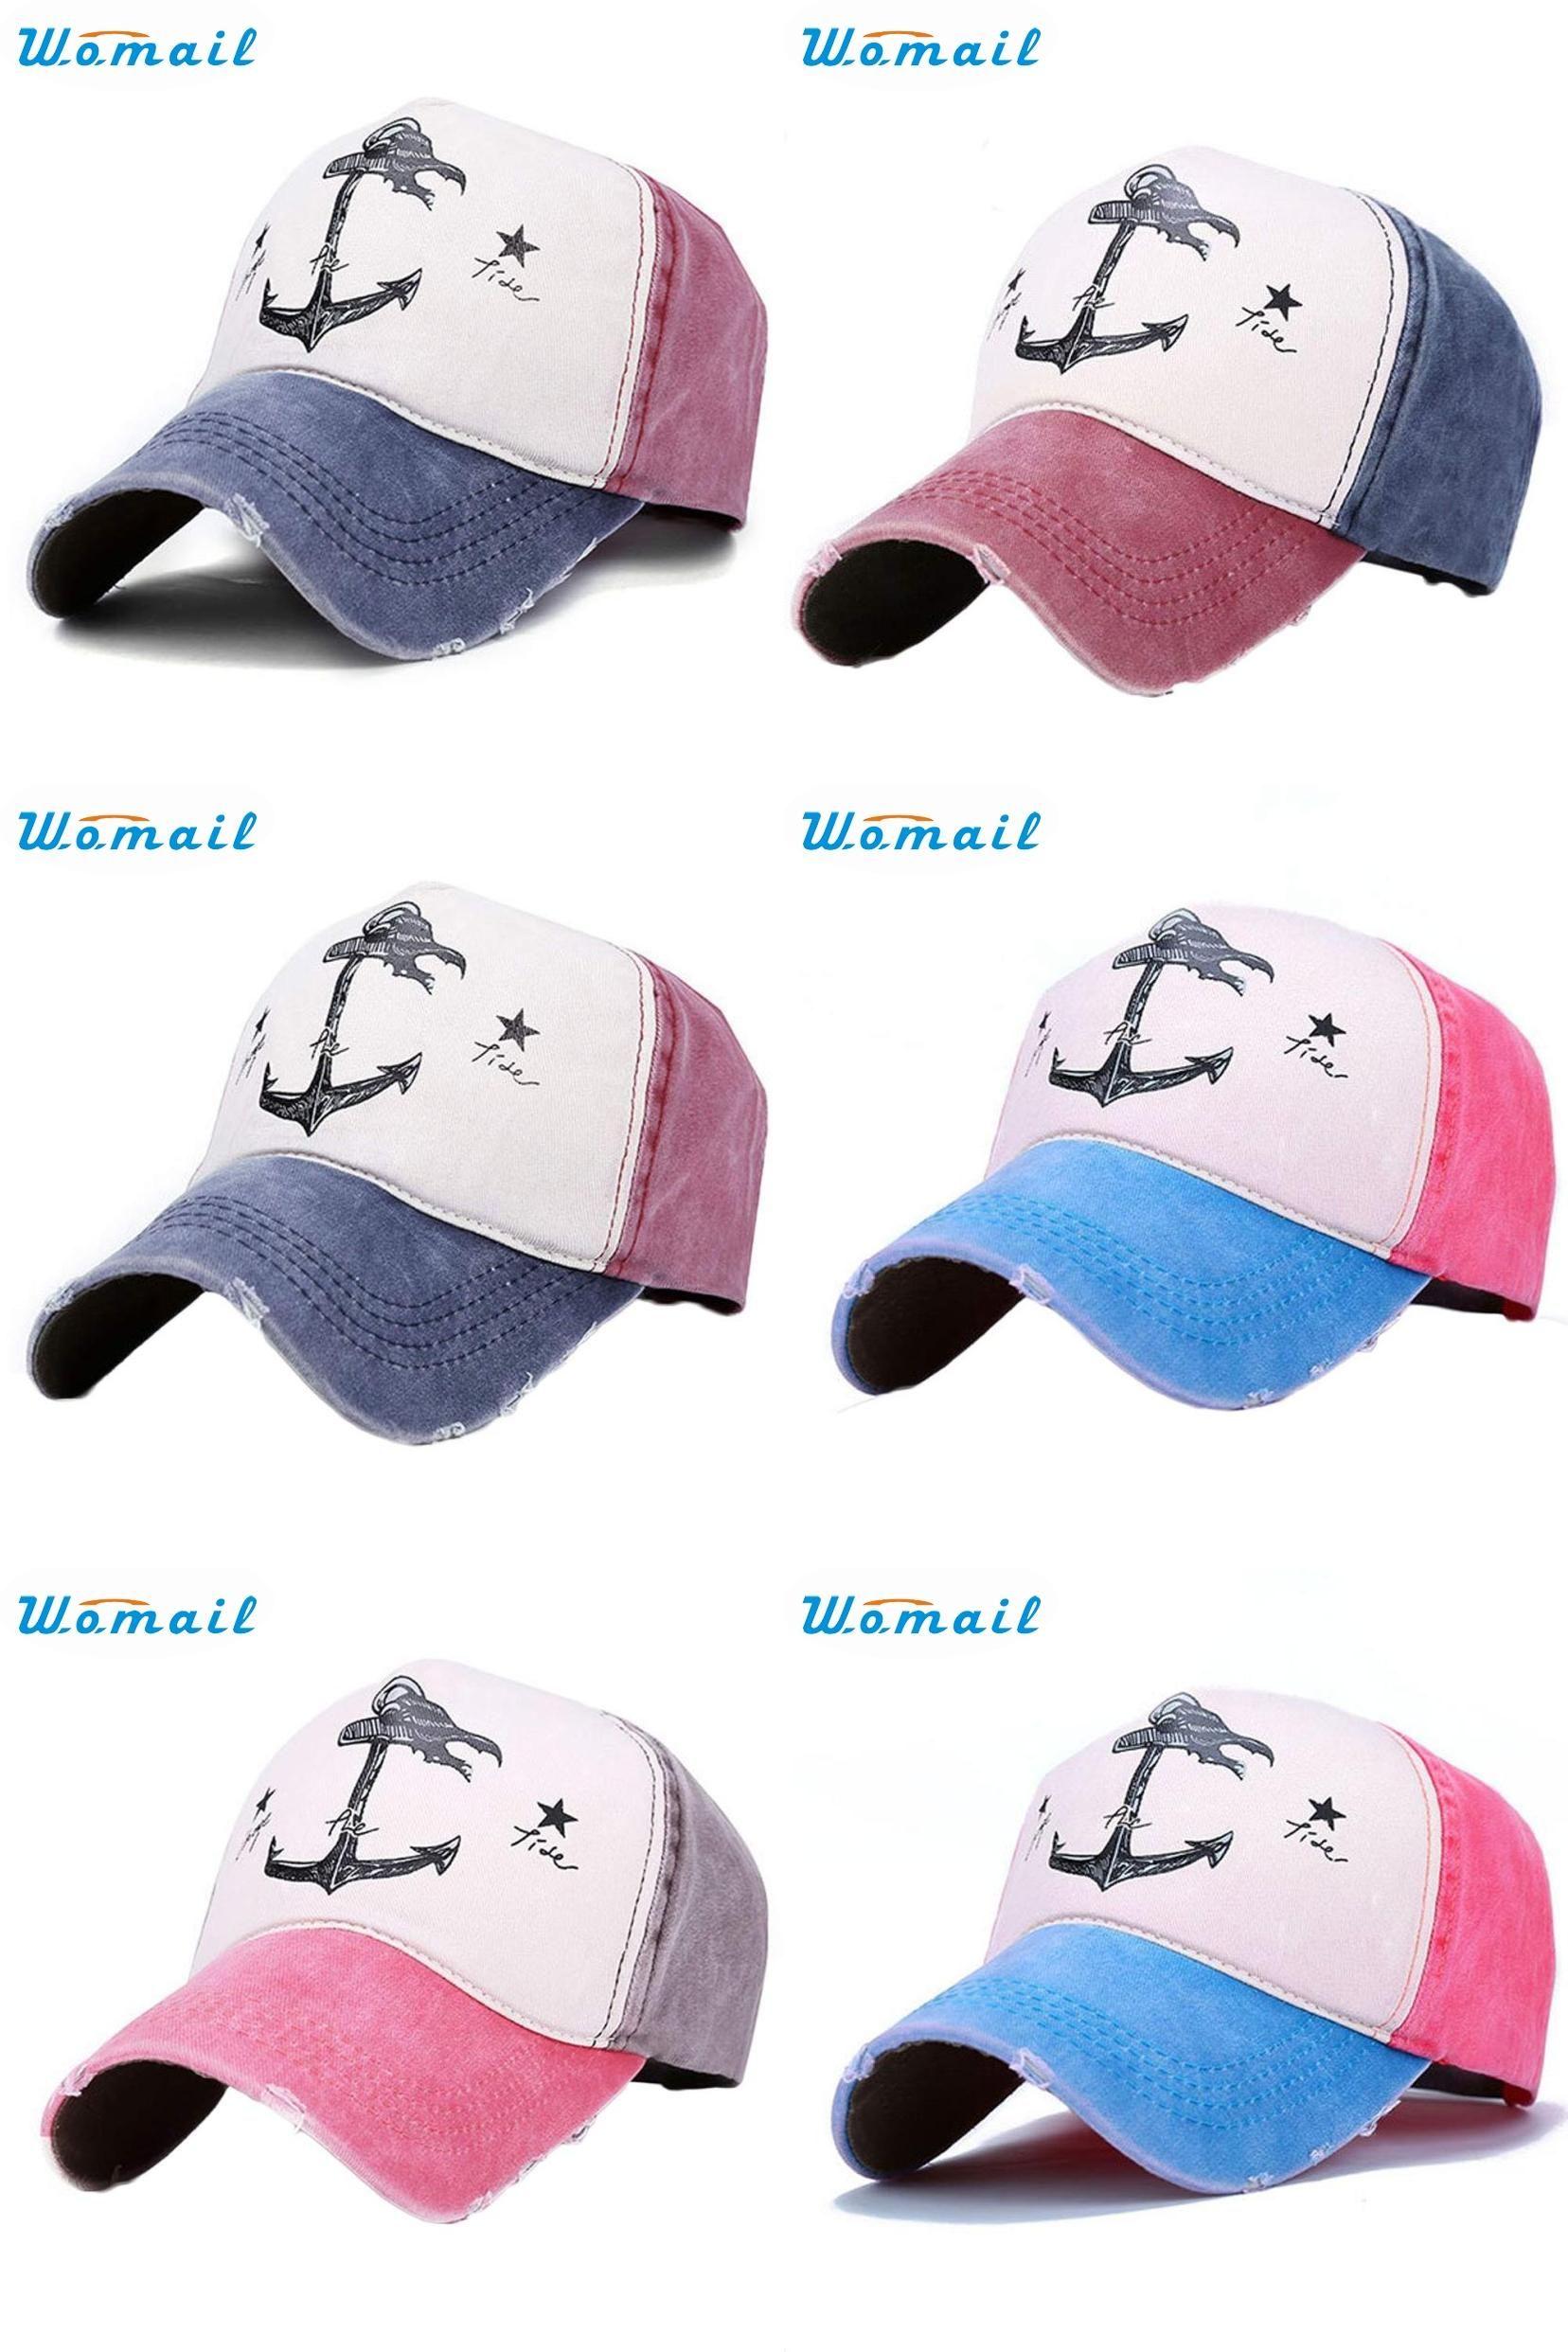 447c1e69cb5  Visit to Buy  Snapback Newly Design HOT best Baseball Cap Vintage Anchor  Printed Summer